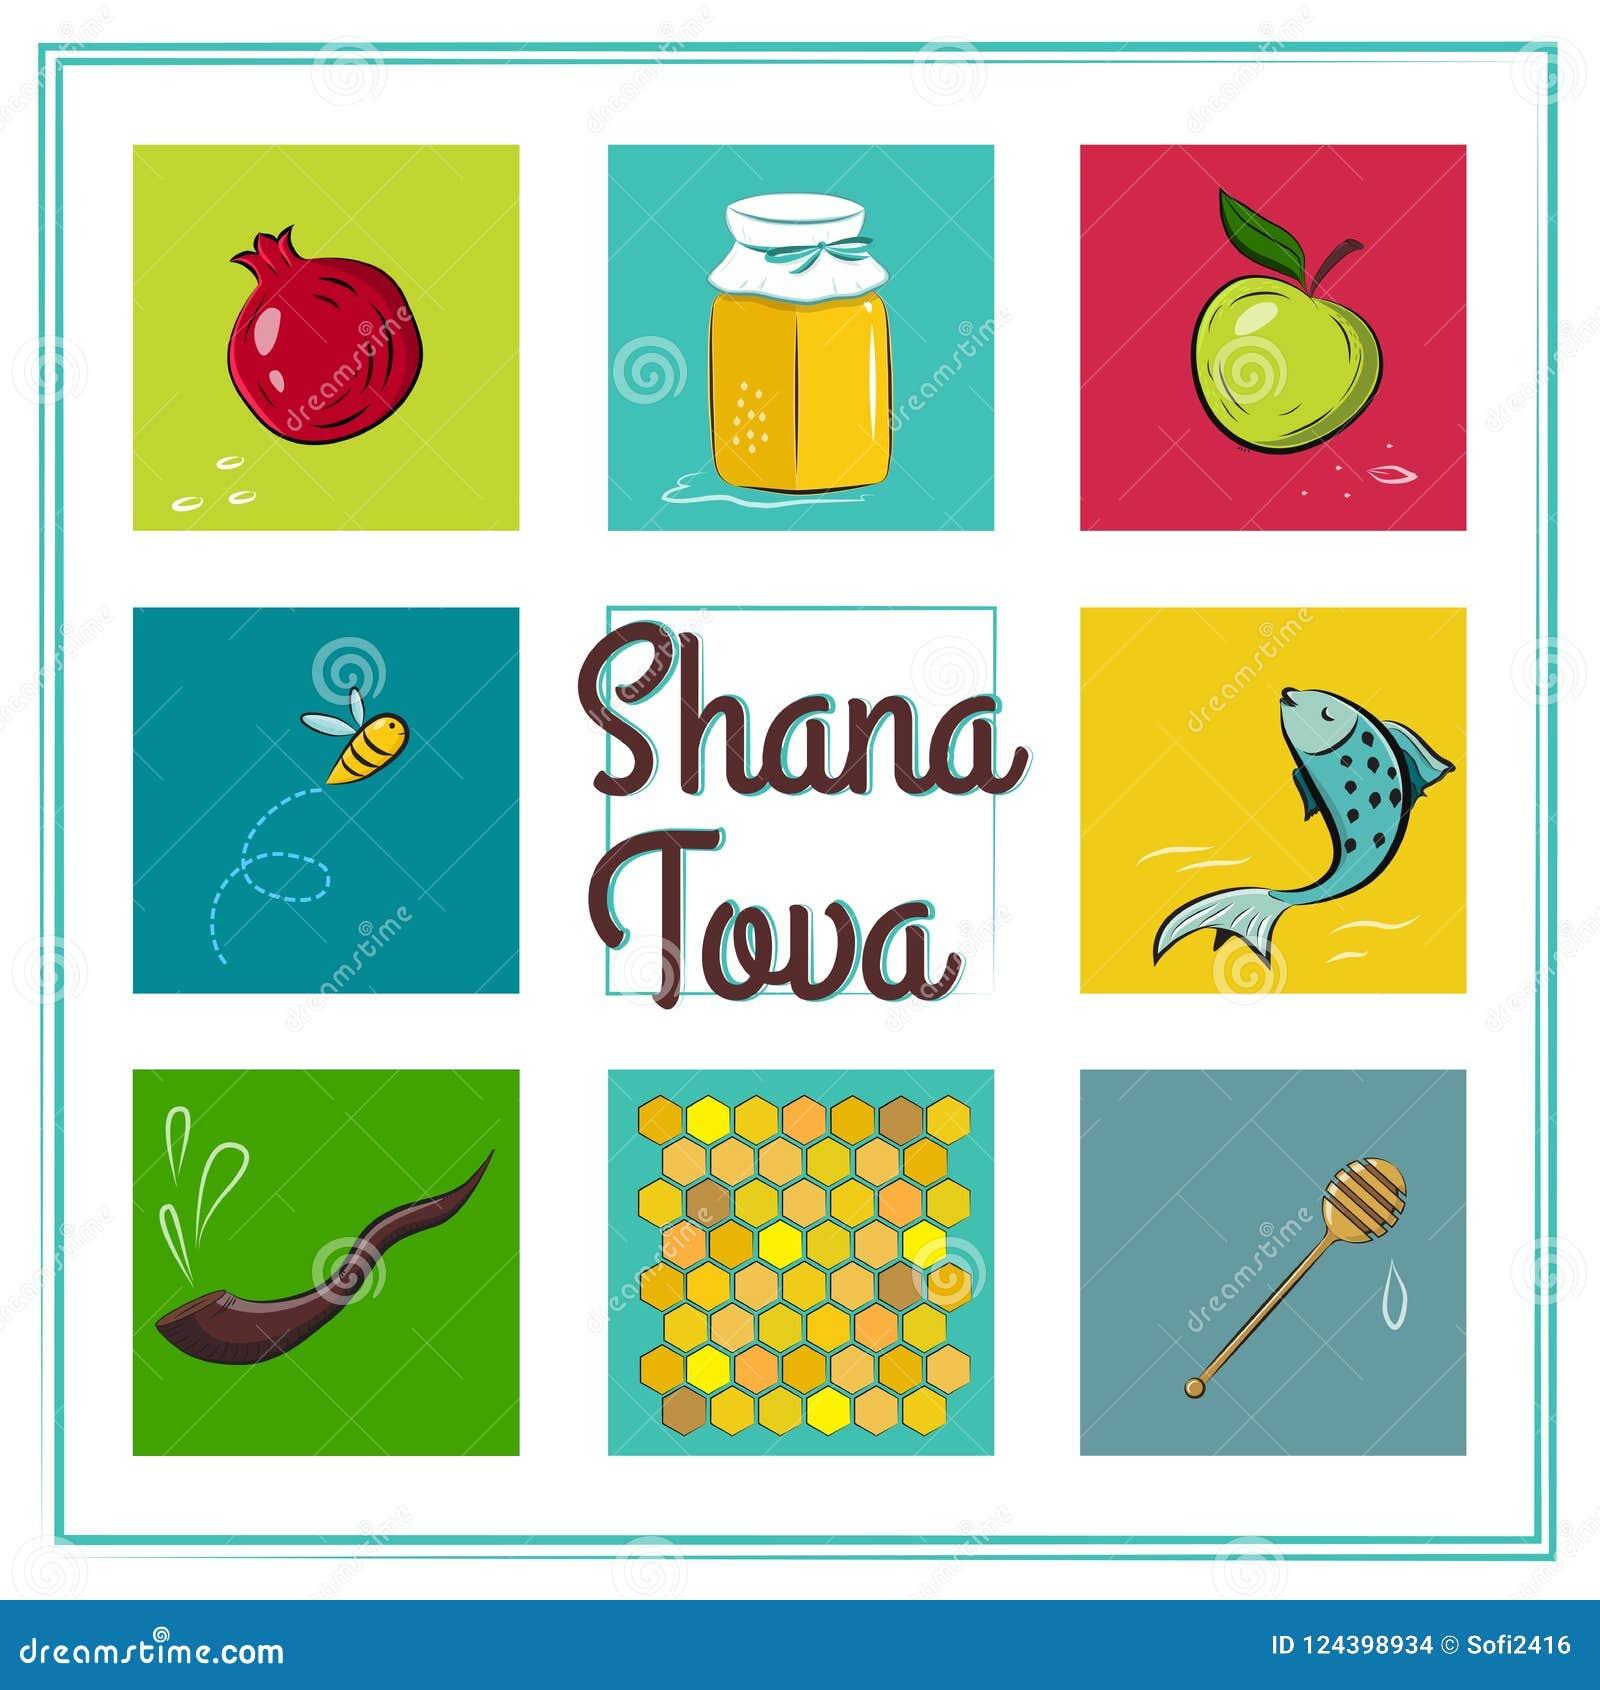 SHANA TOVA CARD. Icons of Rosh Hashanah Jewish New year